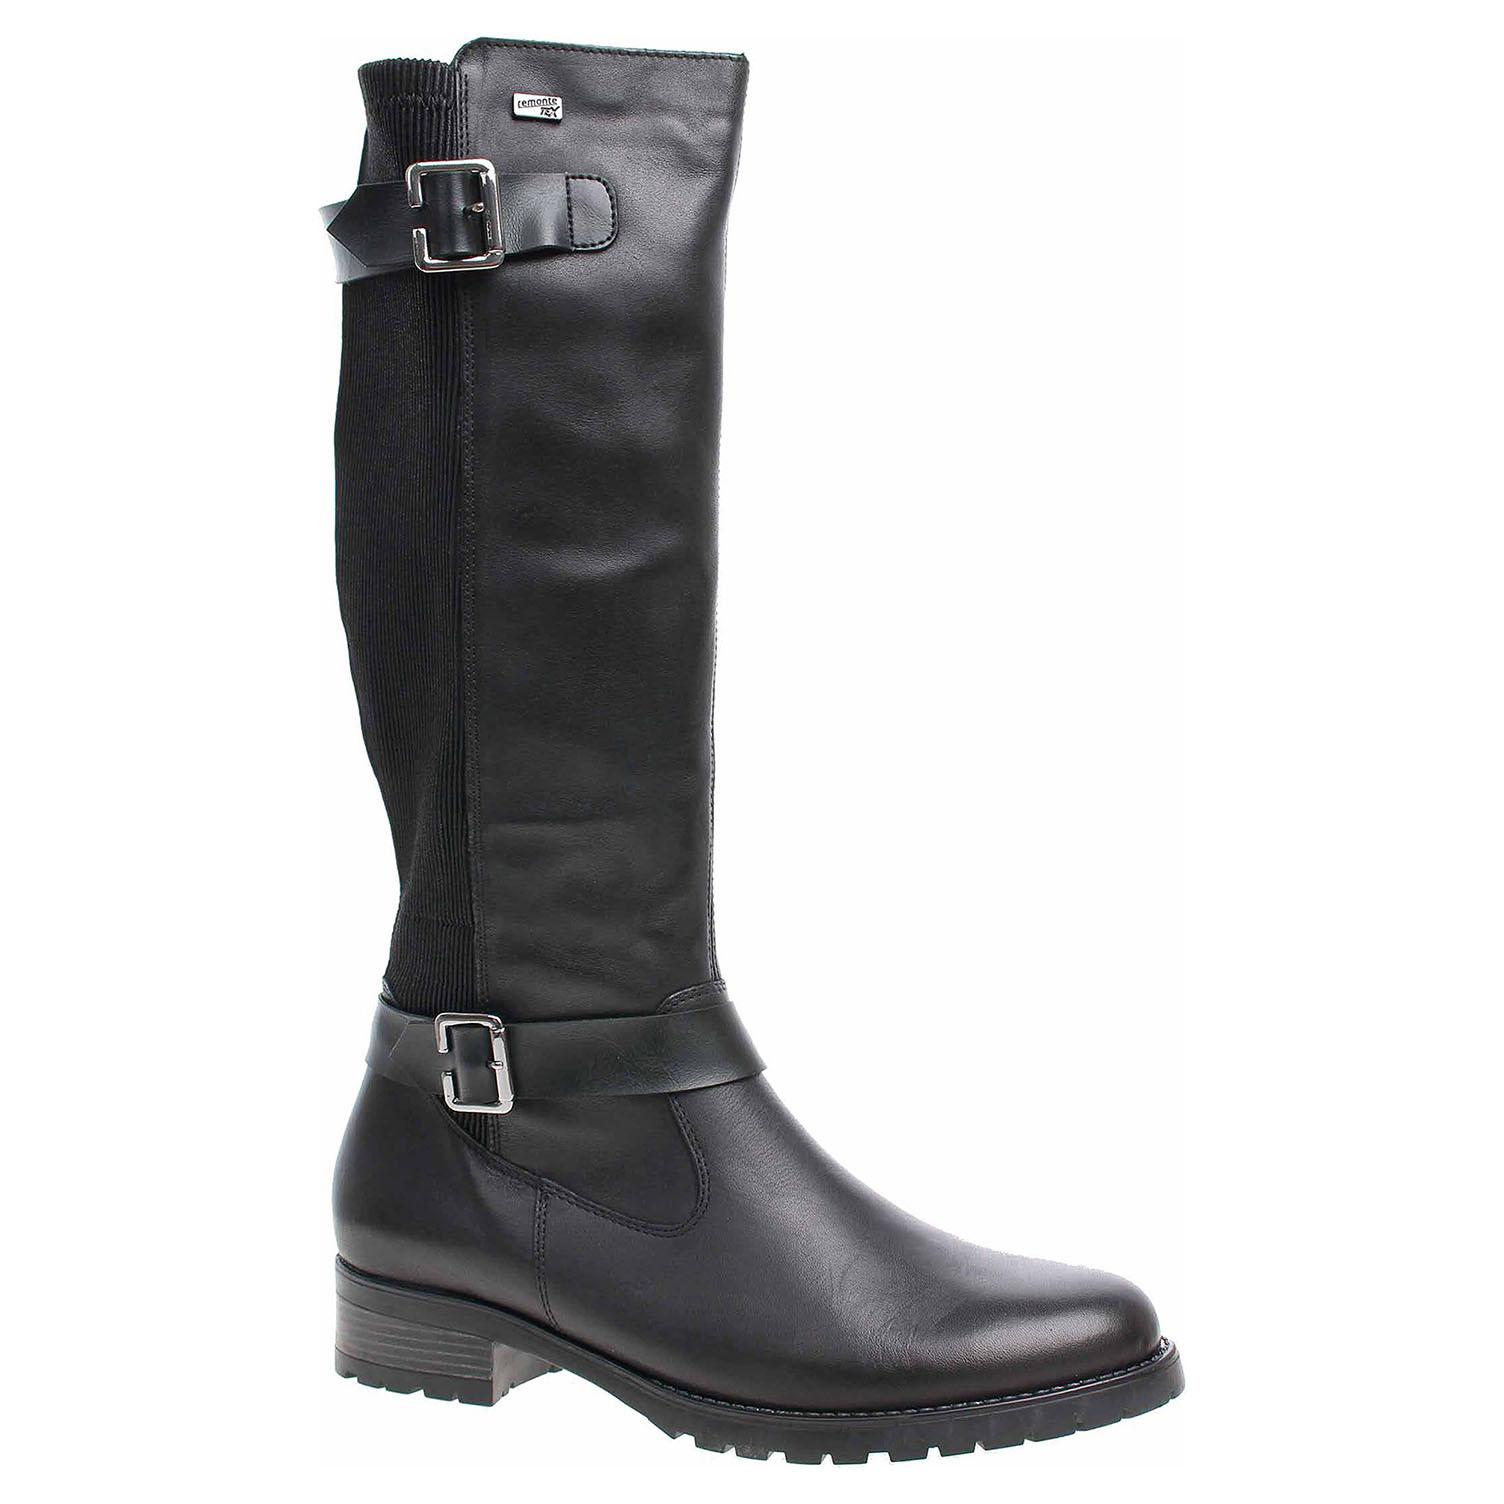 38793c50fa15e Dámske čižmy Remonte D8284-01 schwarz   REJNOK obuv